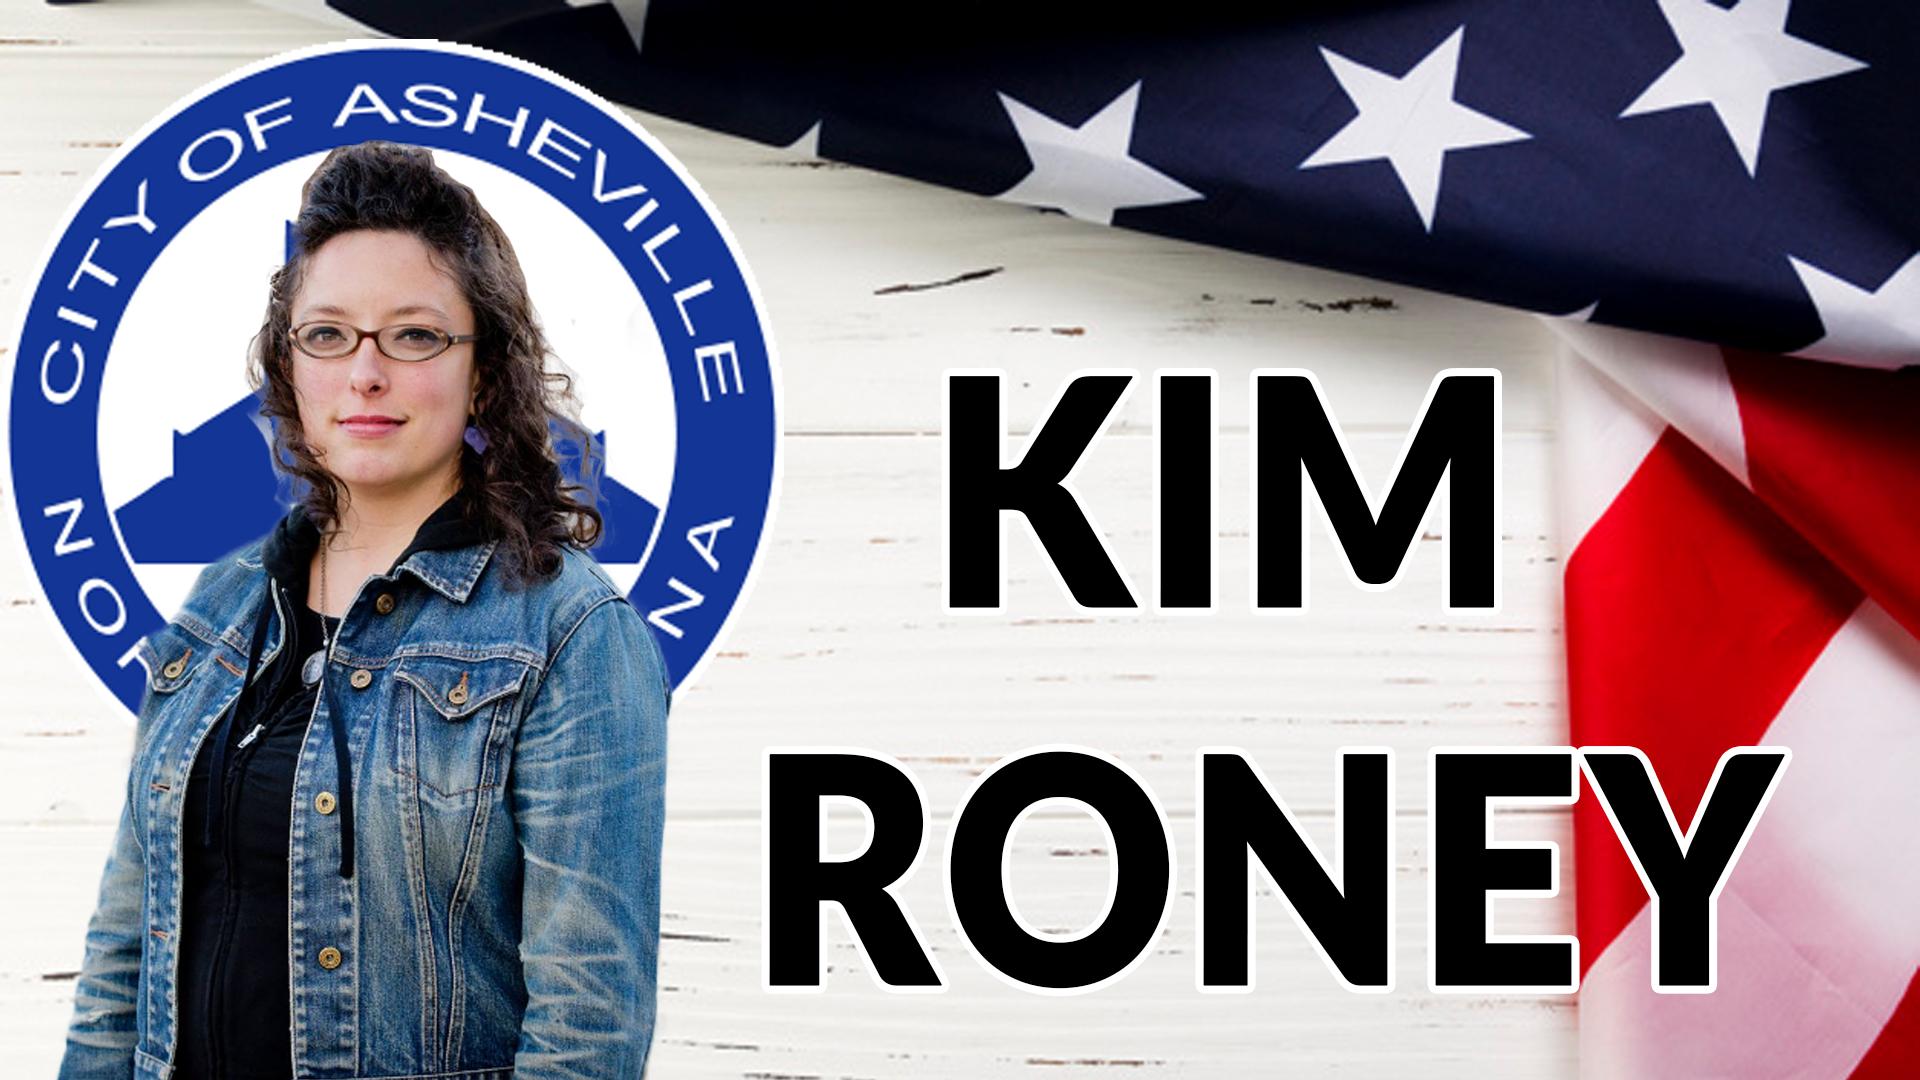 KIM RONEY FOR ASHEVILLE CITY COUNCIL | AREN 139